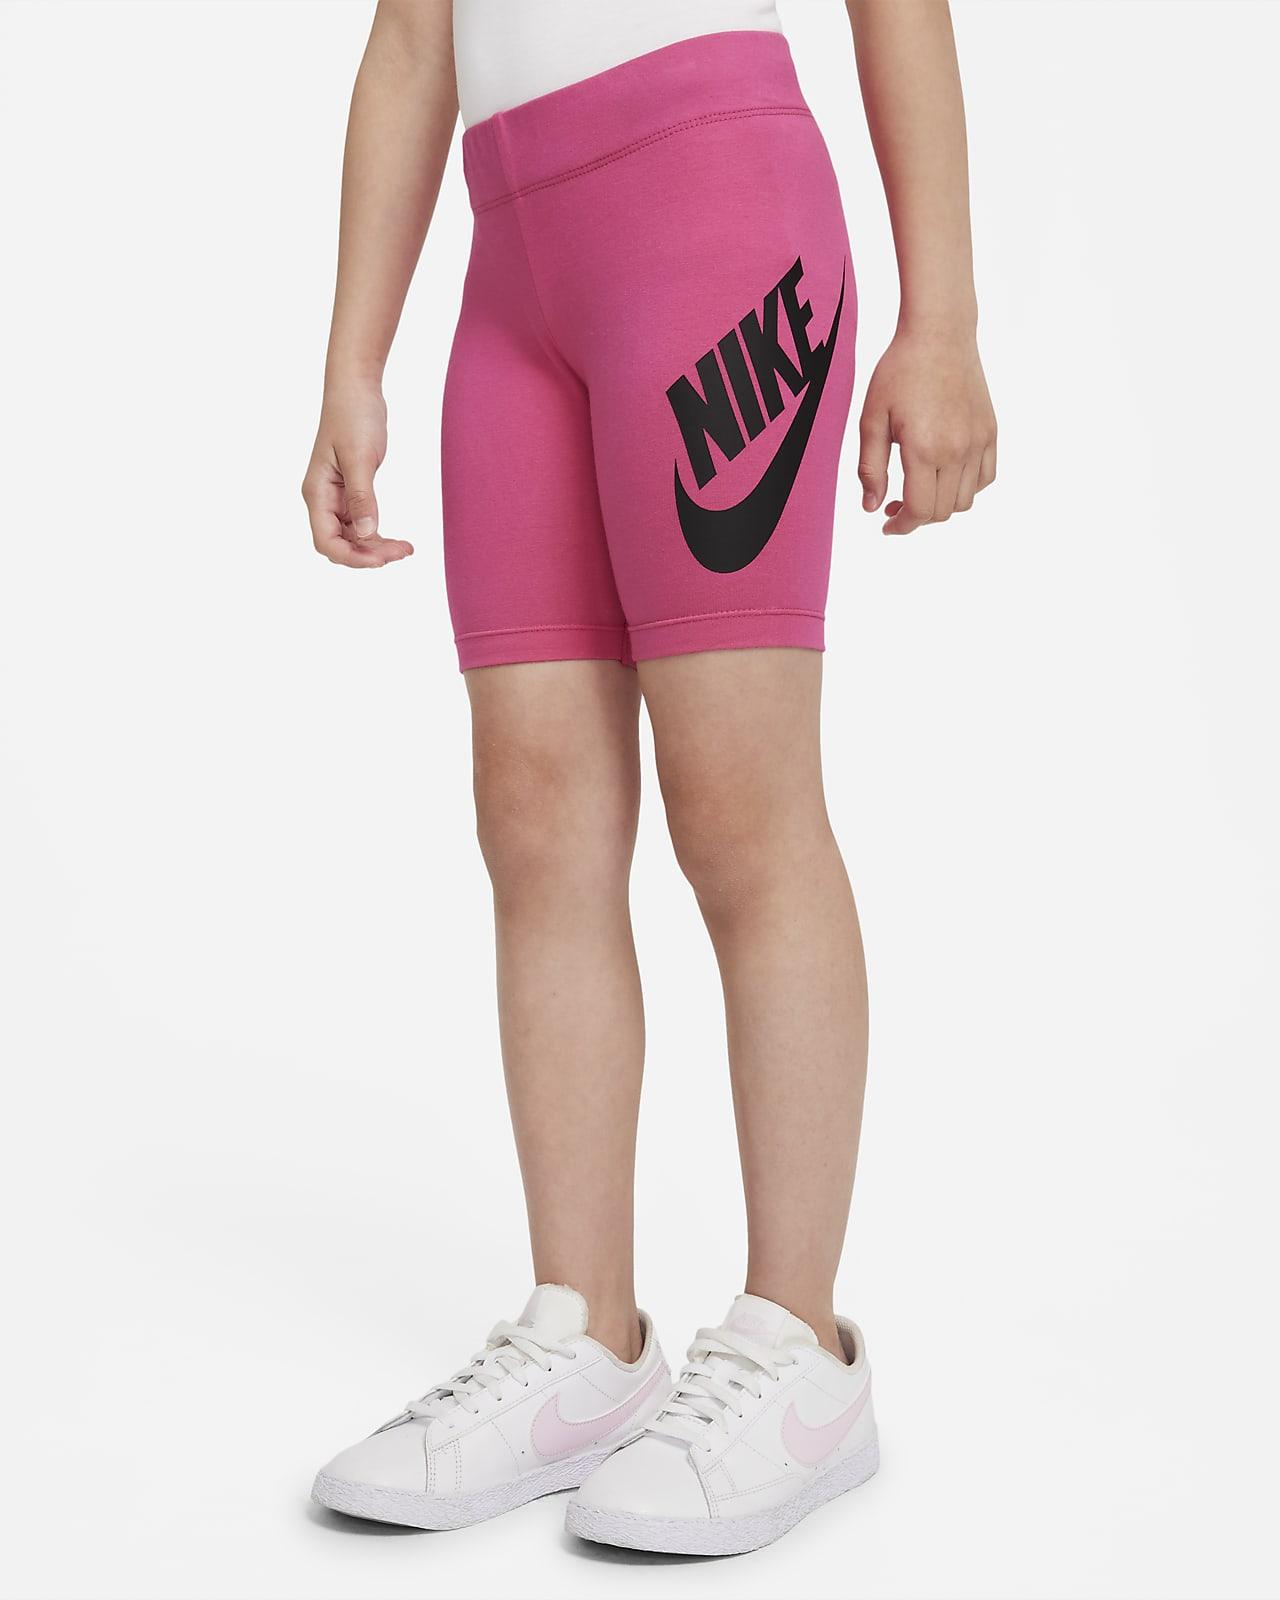 Nike Little Kids' Bike Shorts